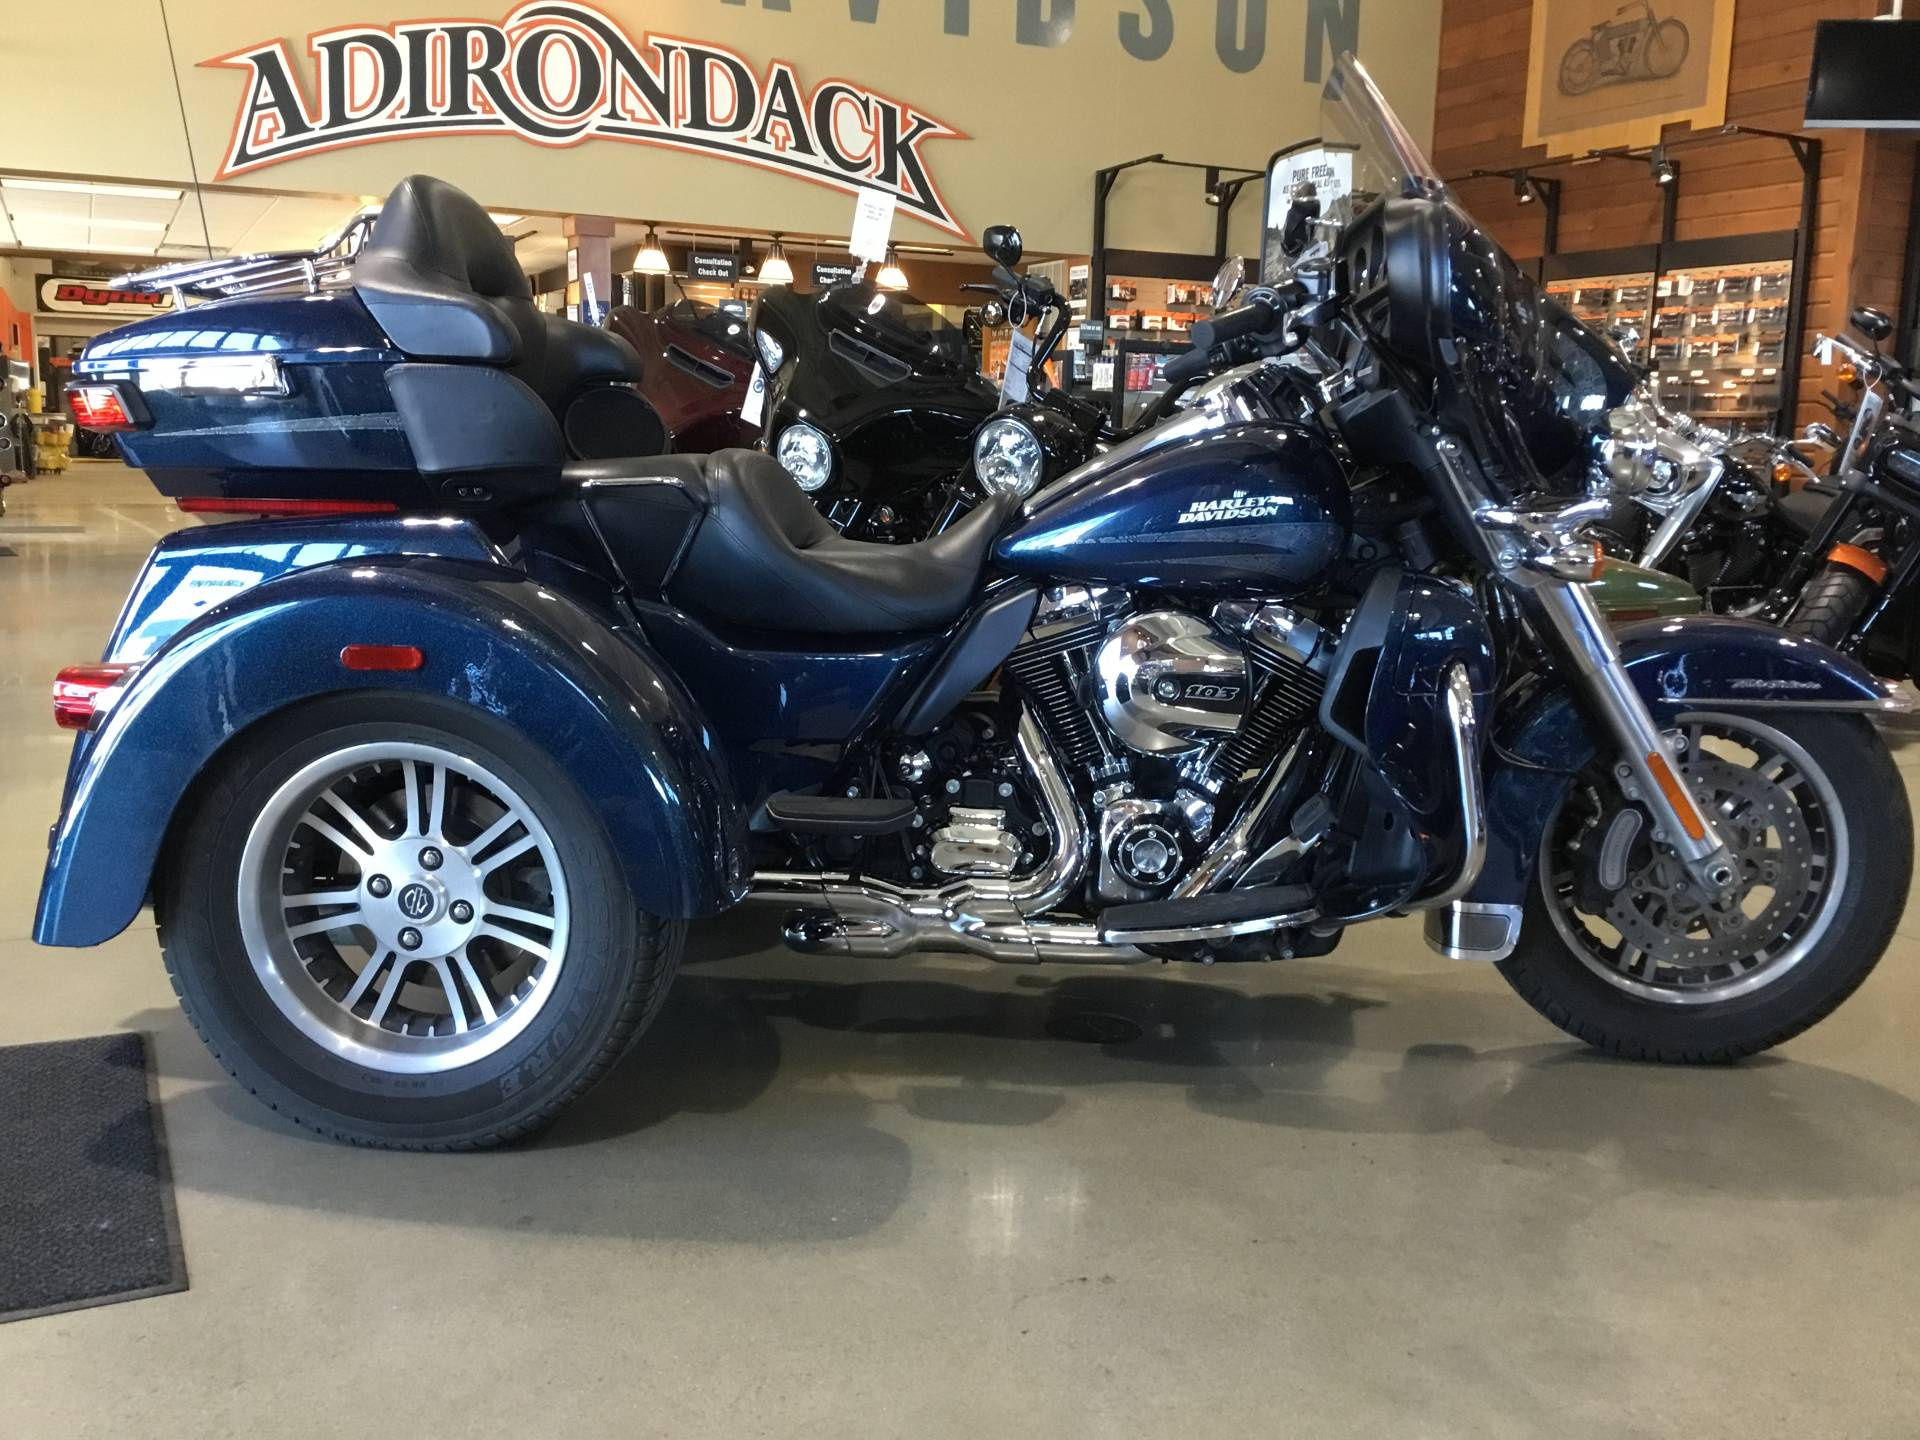 The 2016 Harley Davidson Tri Glide Ultra Provides Three: Used 2016 Harley-Davidson Tri Glide® Ultra Trikes In New